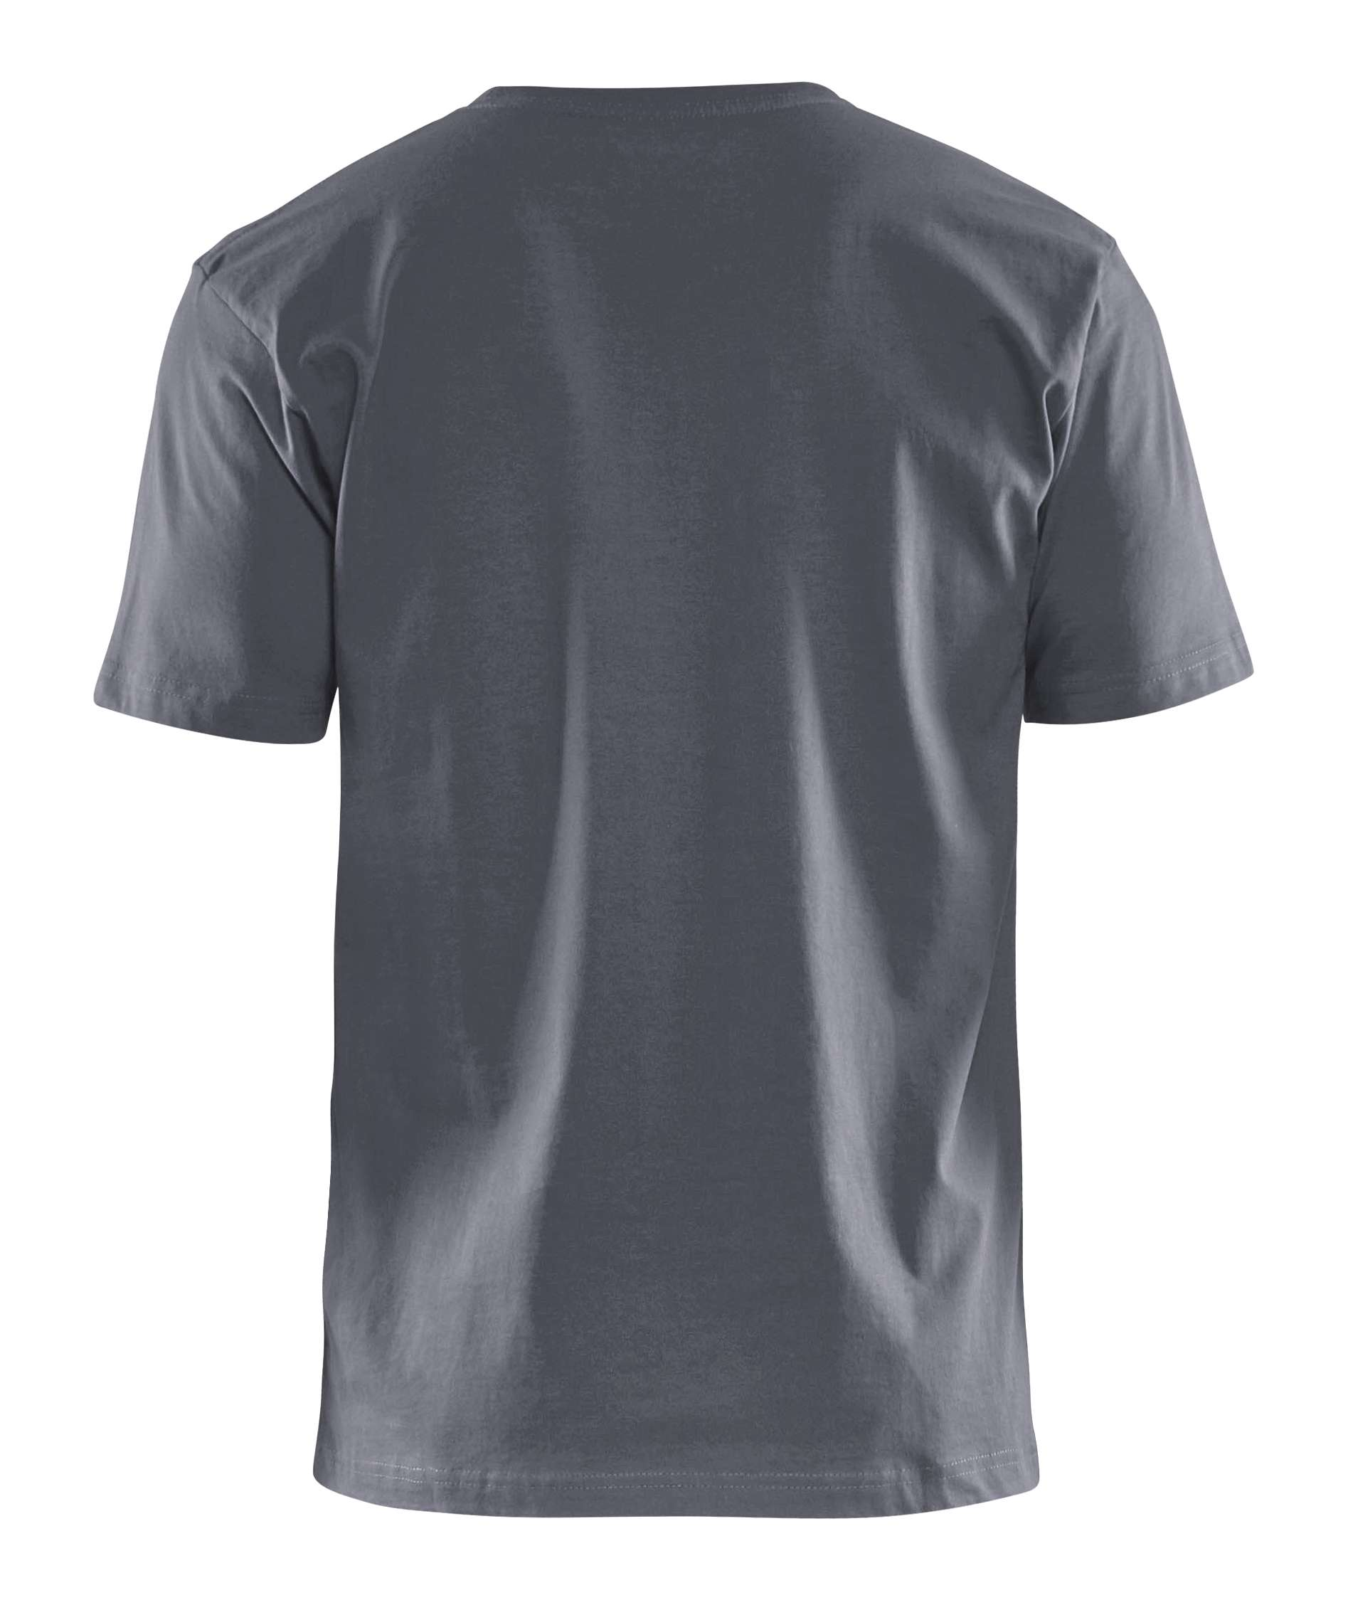 Blaklader T-shirts 33001030 grijs(9400)